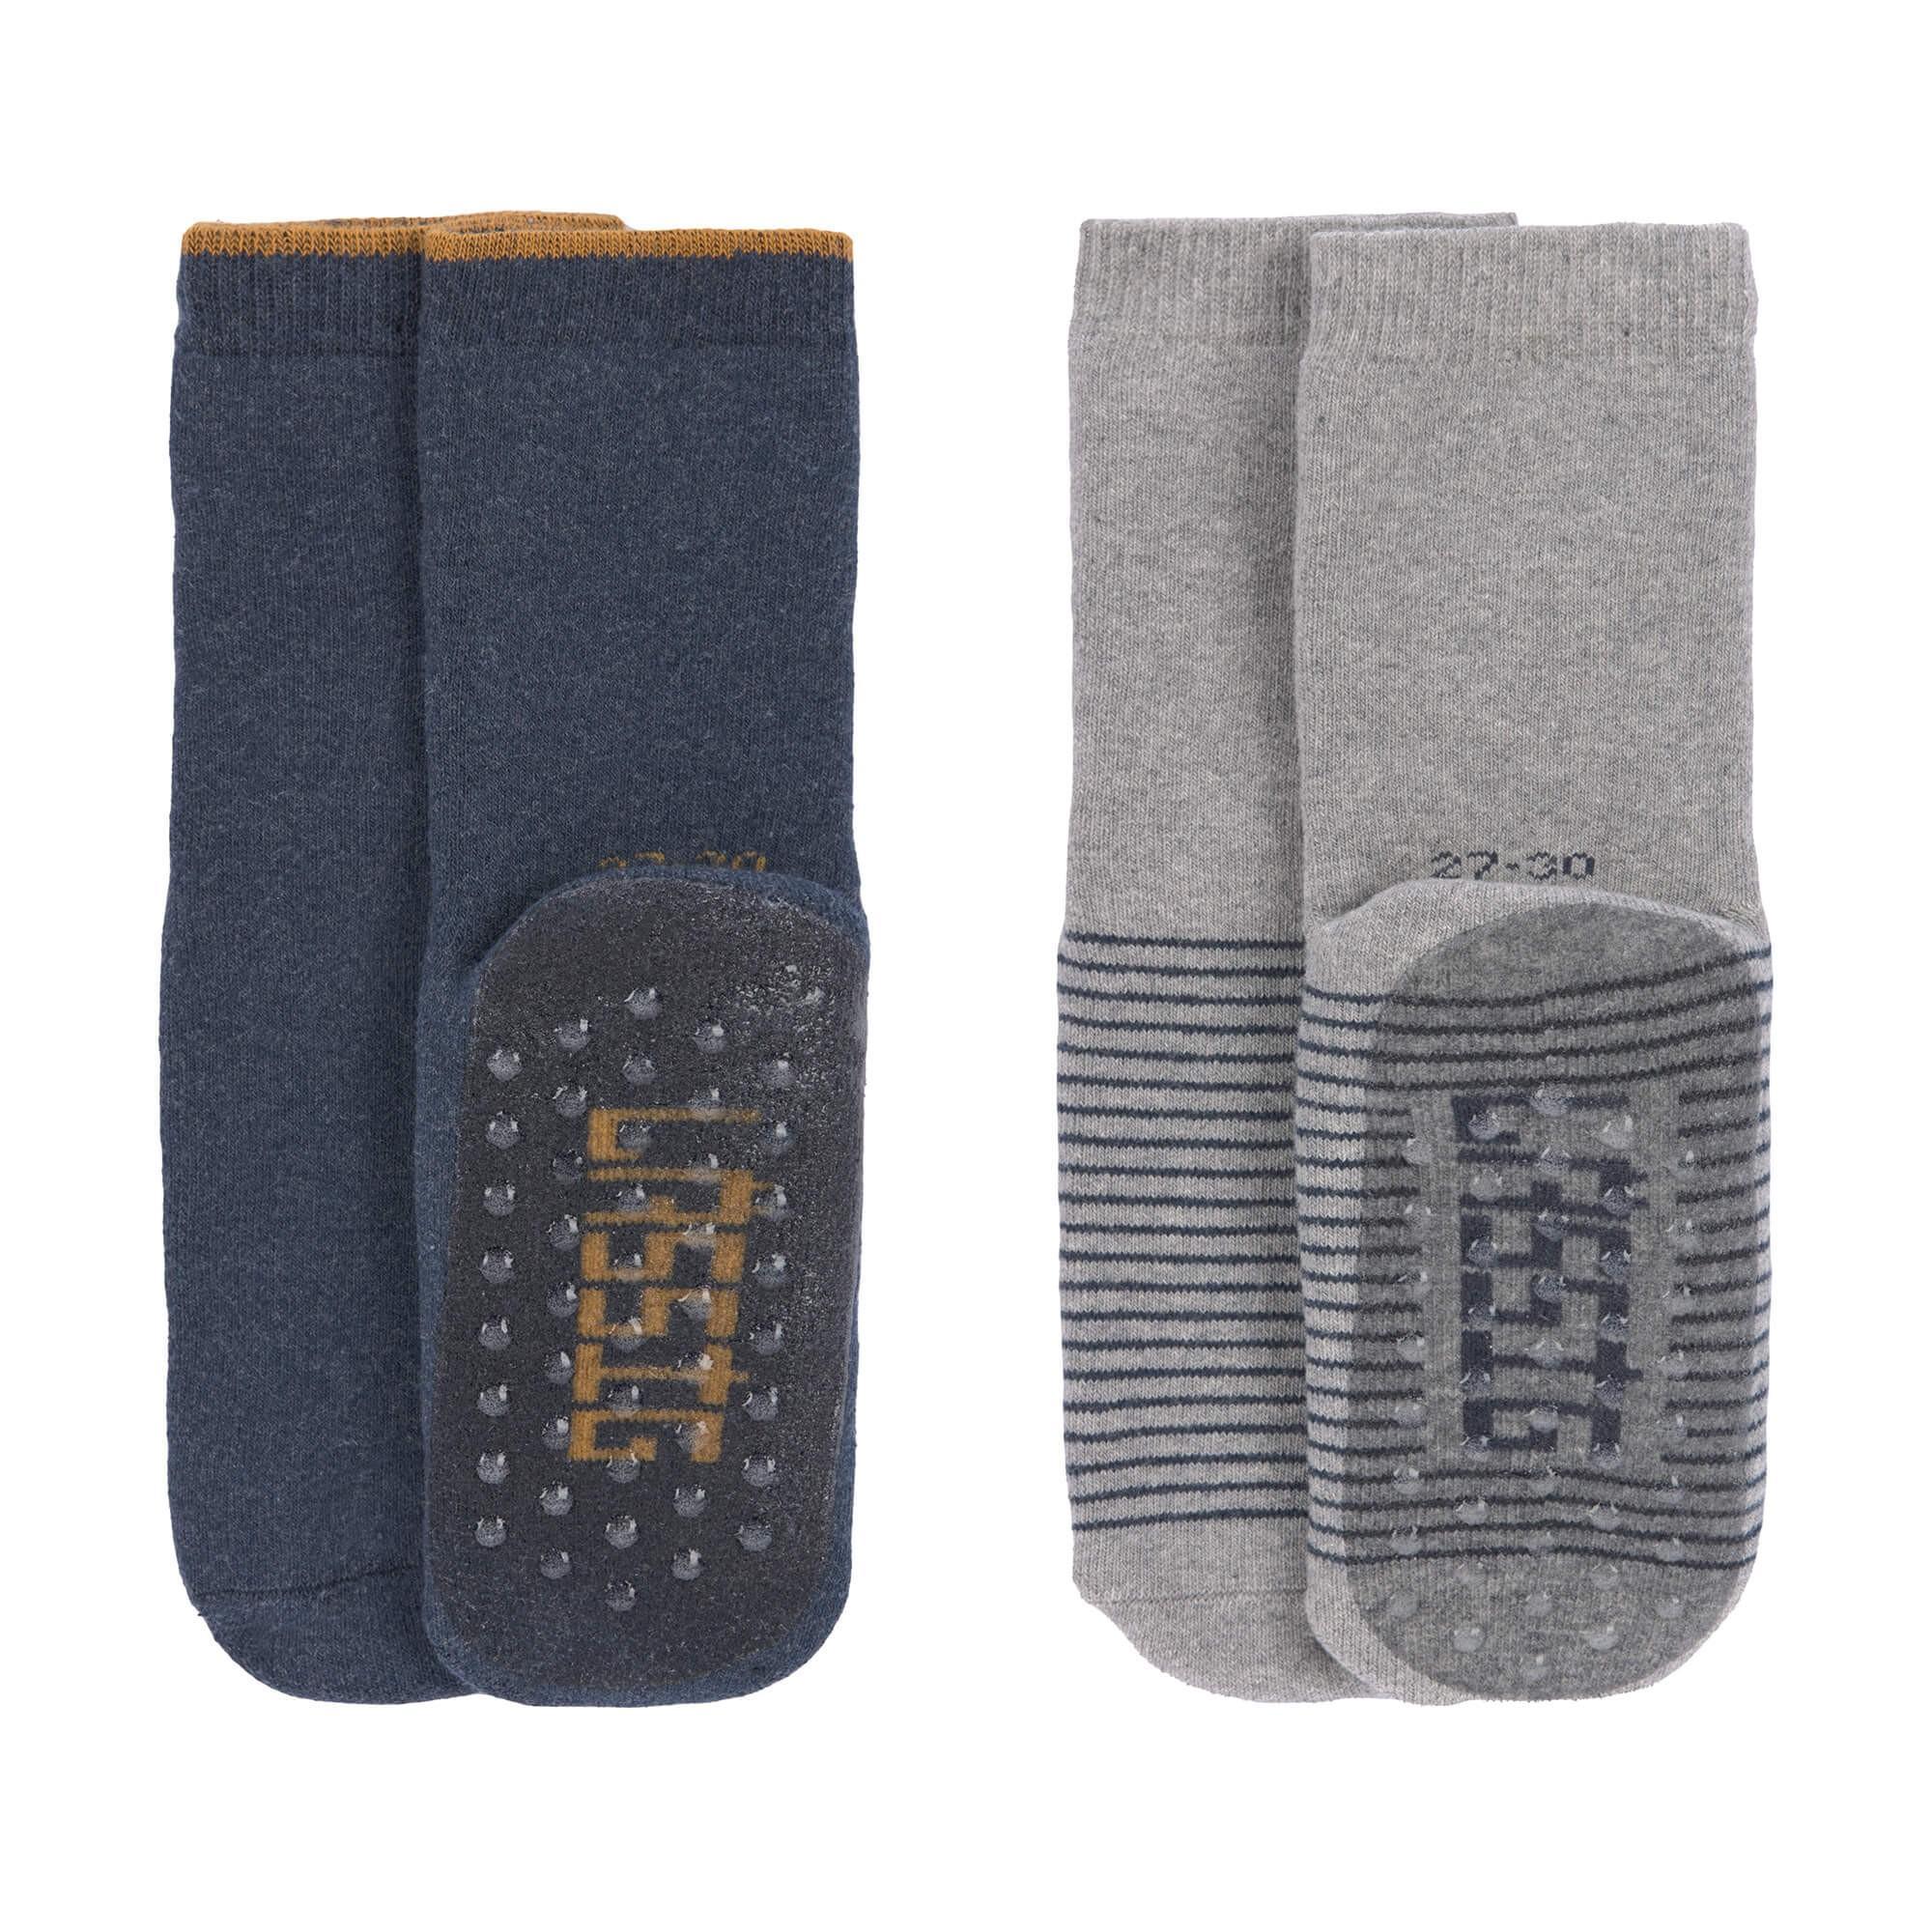 Lassig - Anti-slip Socks 2 pcs. assorted blue/grey, Size: 15-18